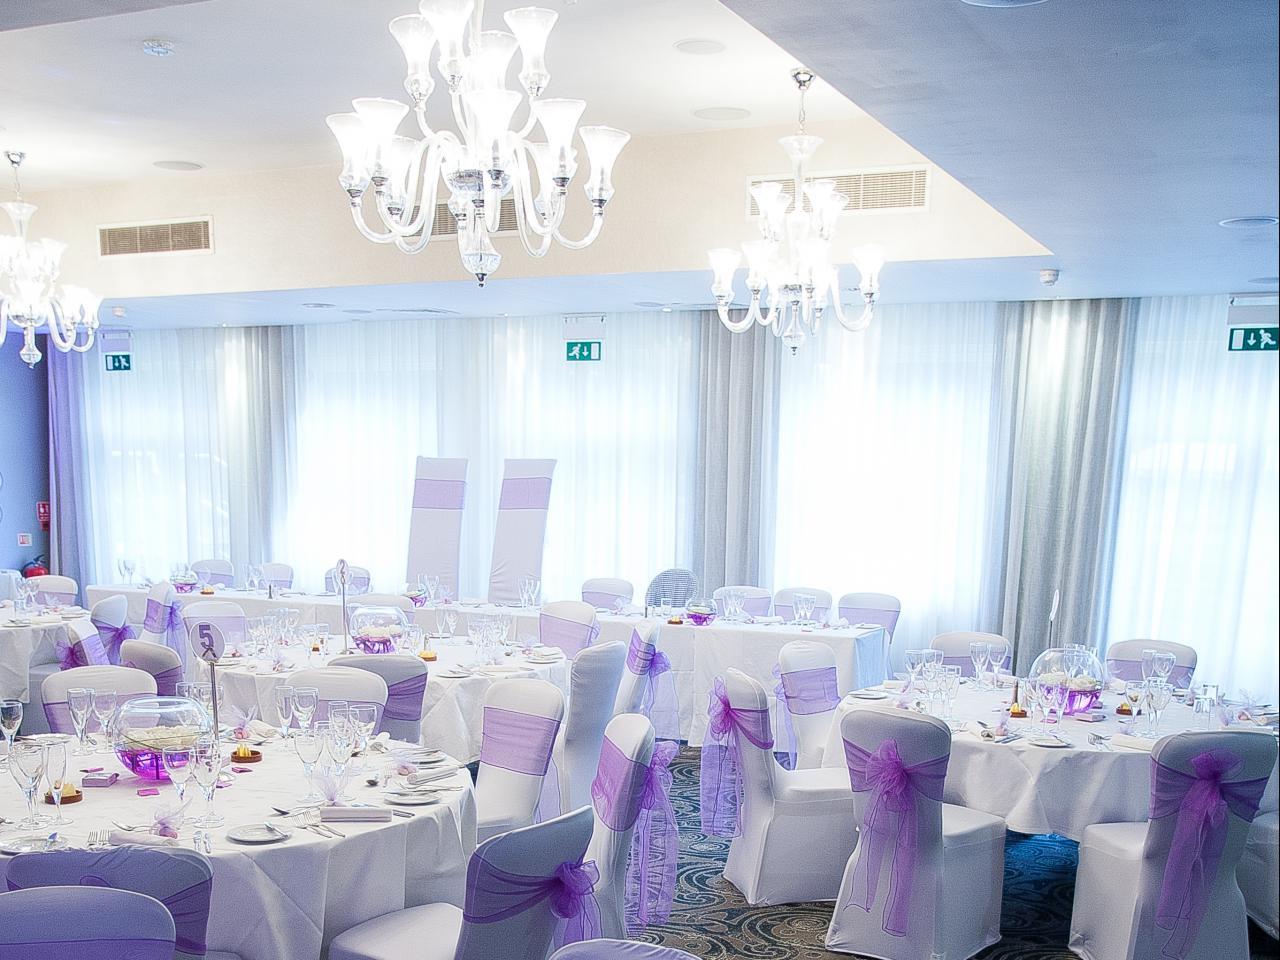 Slough Hotel Wedding Venue Gallery   The Pinewood Hotel Buckinghamshire